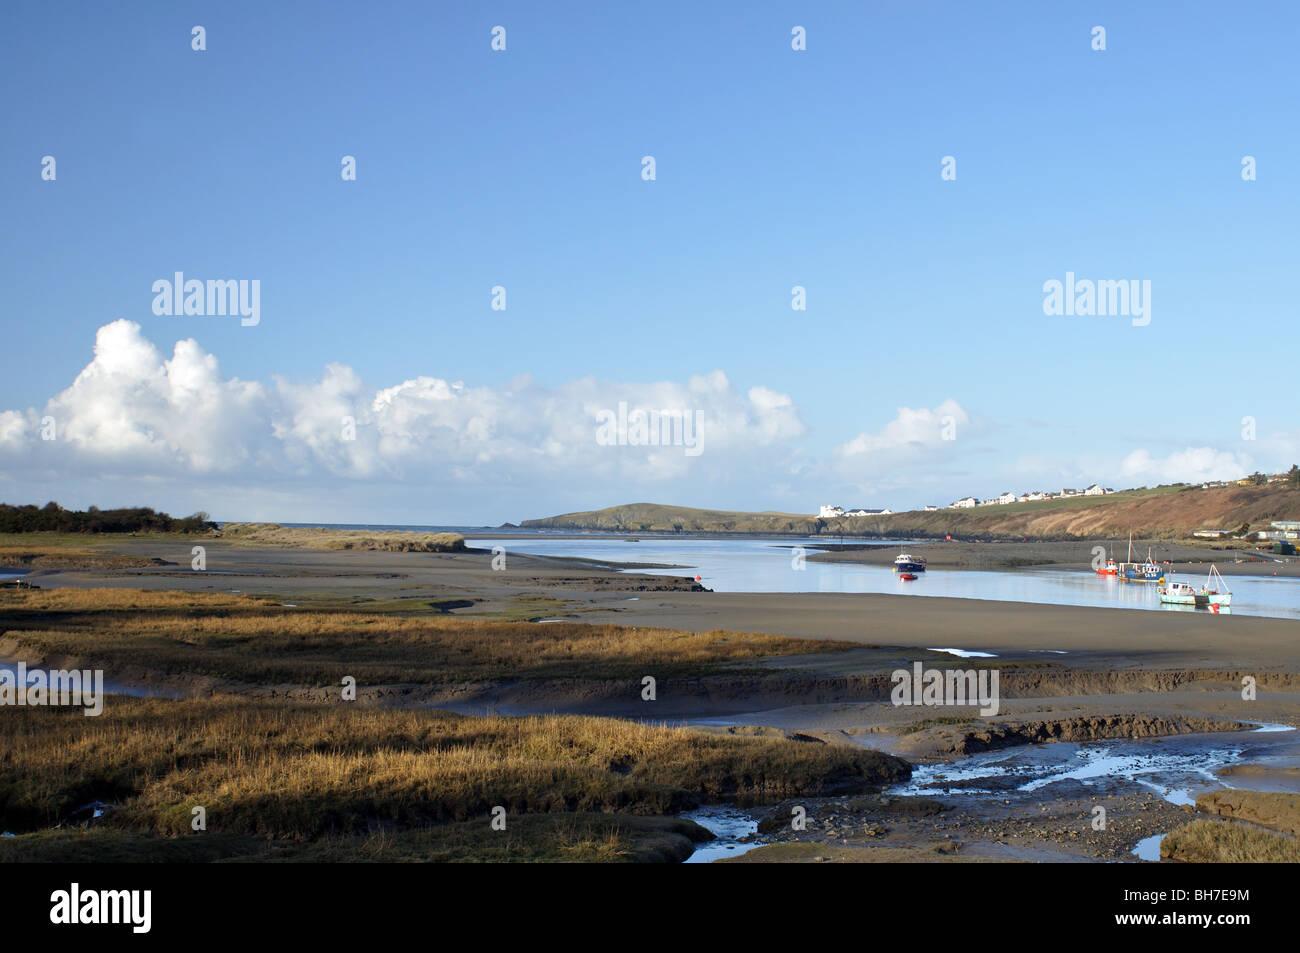 View of Cardigan Island across River Teifi estuary, St Dogmaels, Pembrokeshire, Wales, United Kingdom Stock Photo